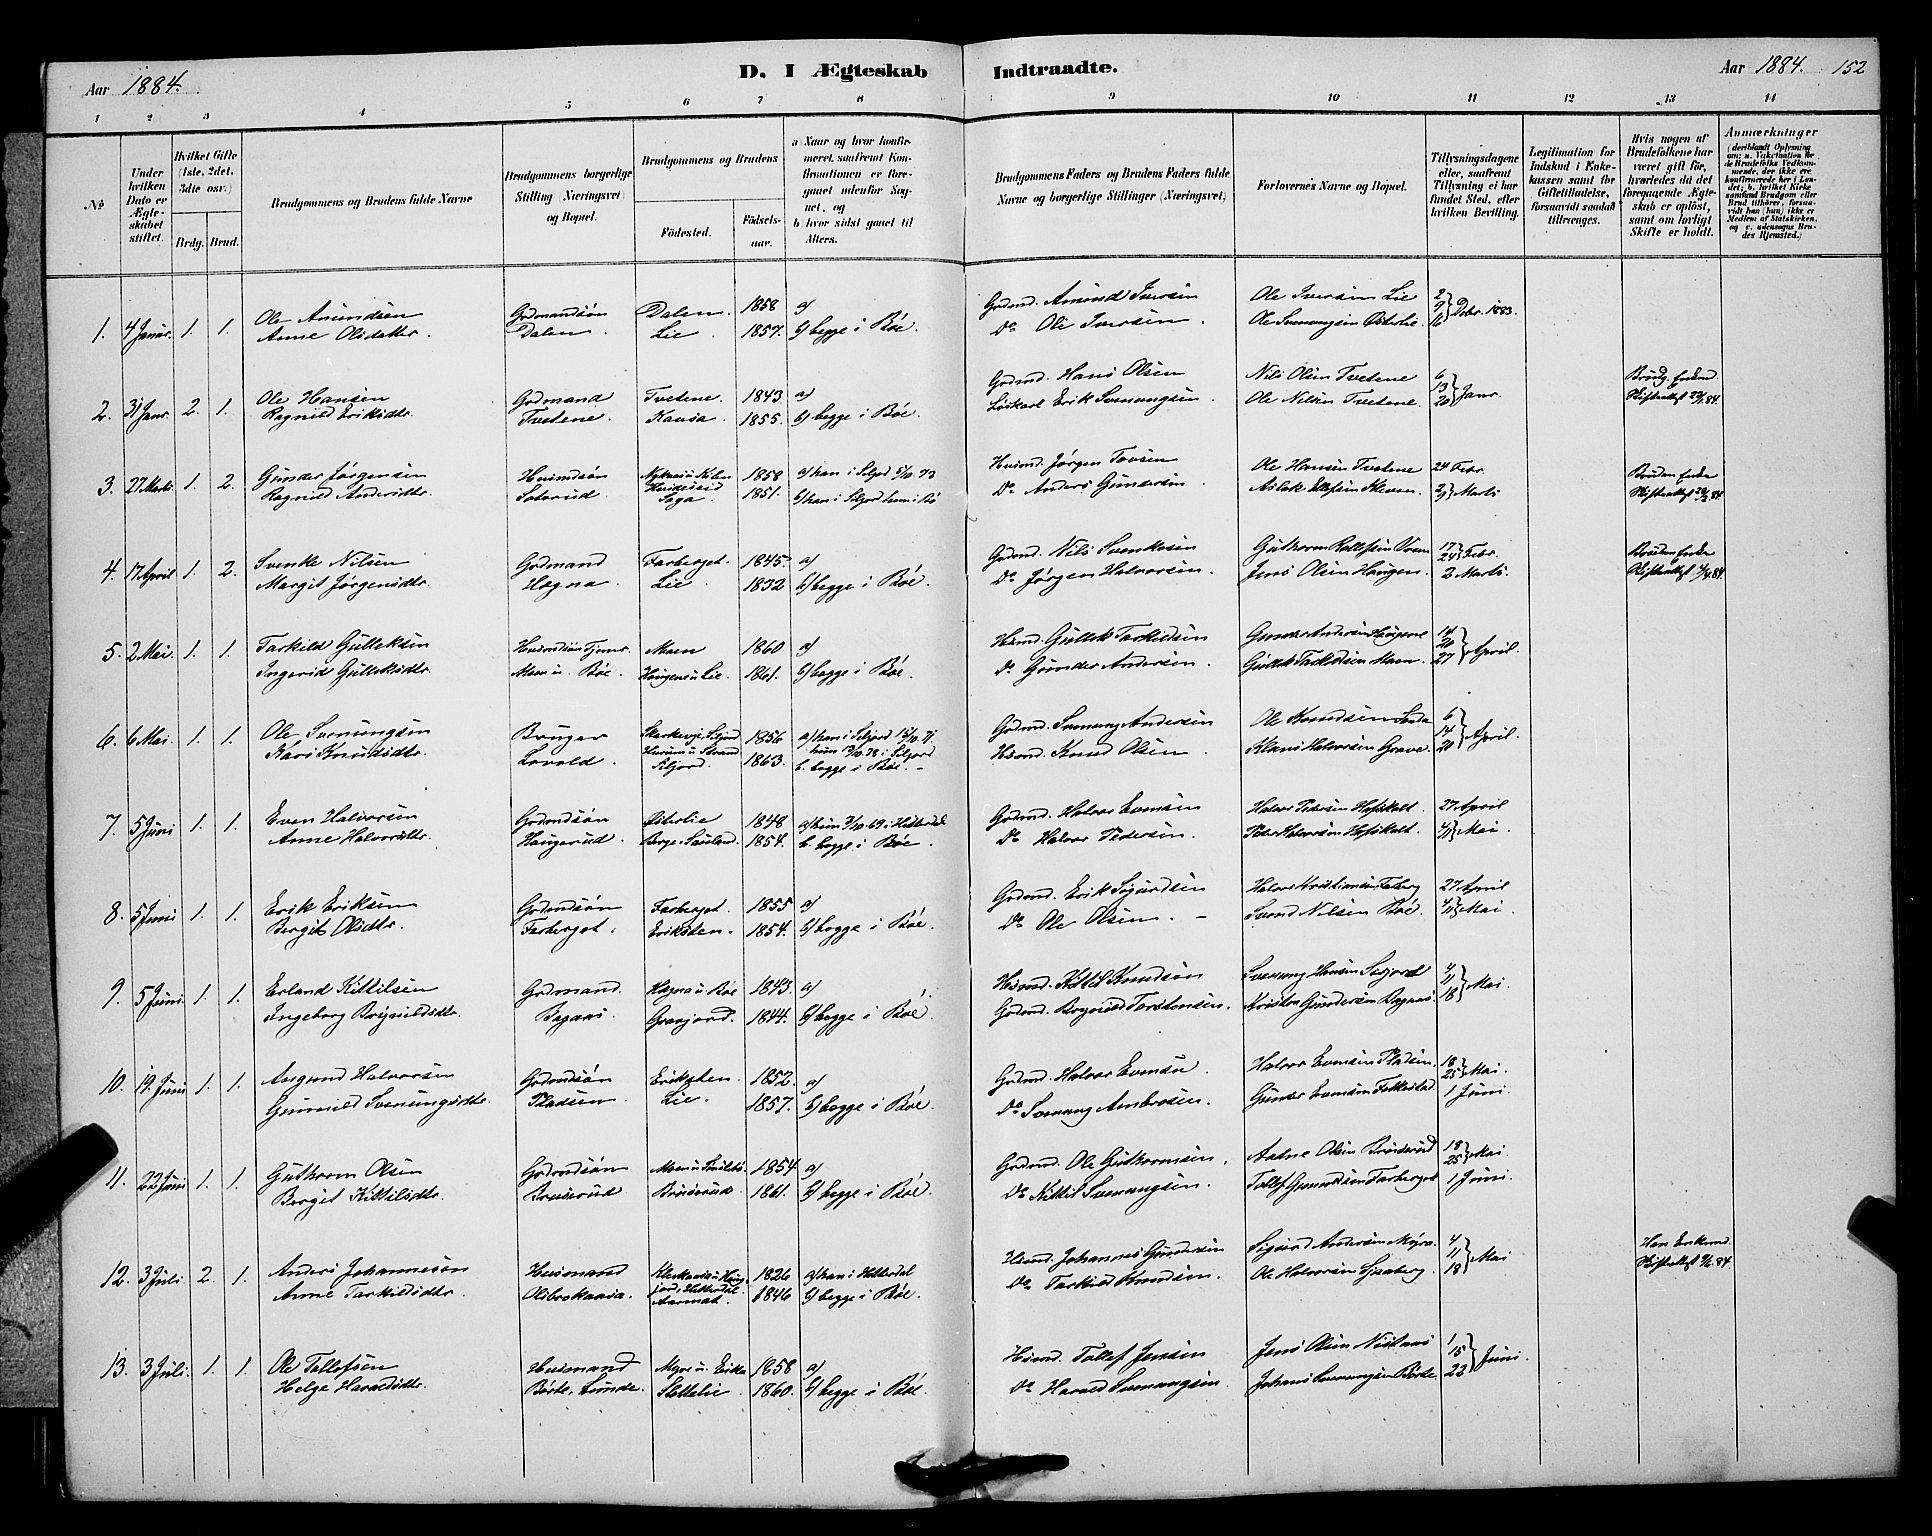 SAKO, Bø kirkebøker, G/Ga/L0005: Klokkerbok nr. 5, 1883-1897, s. 152